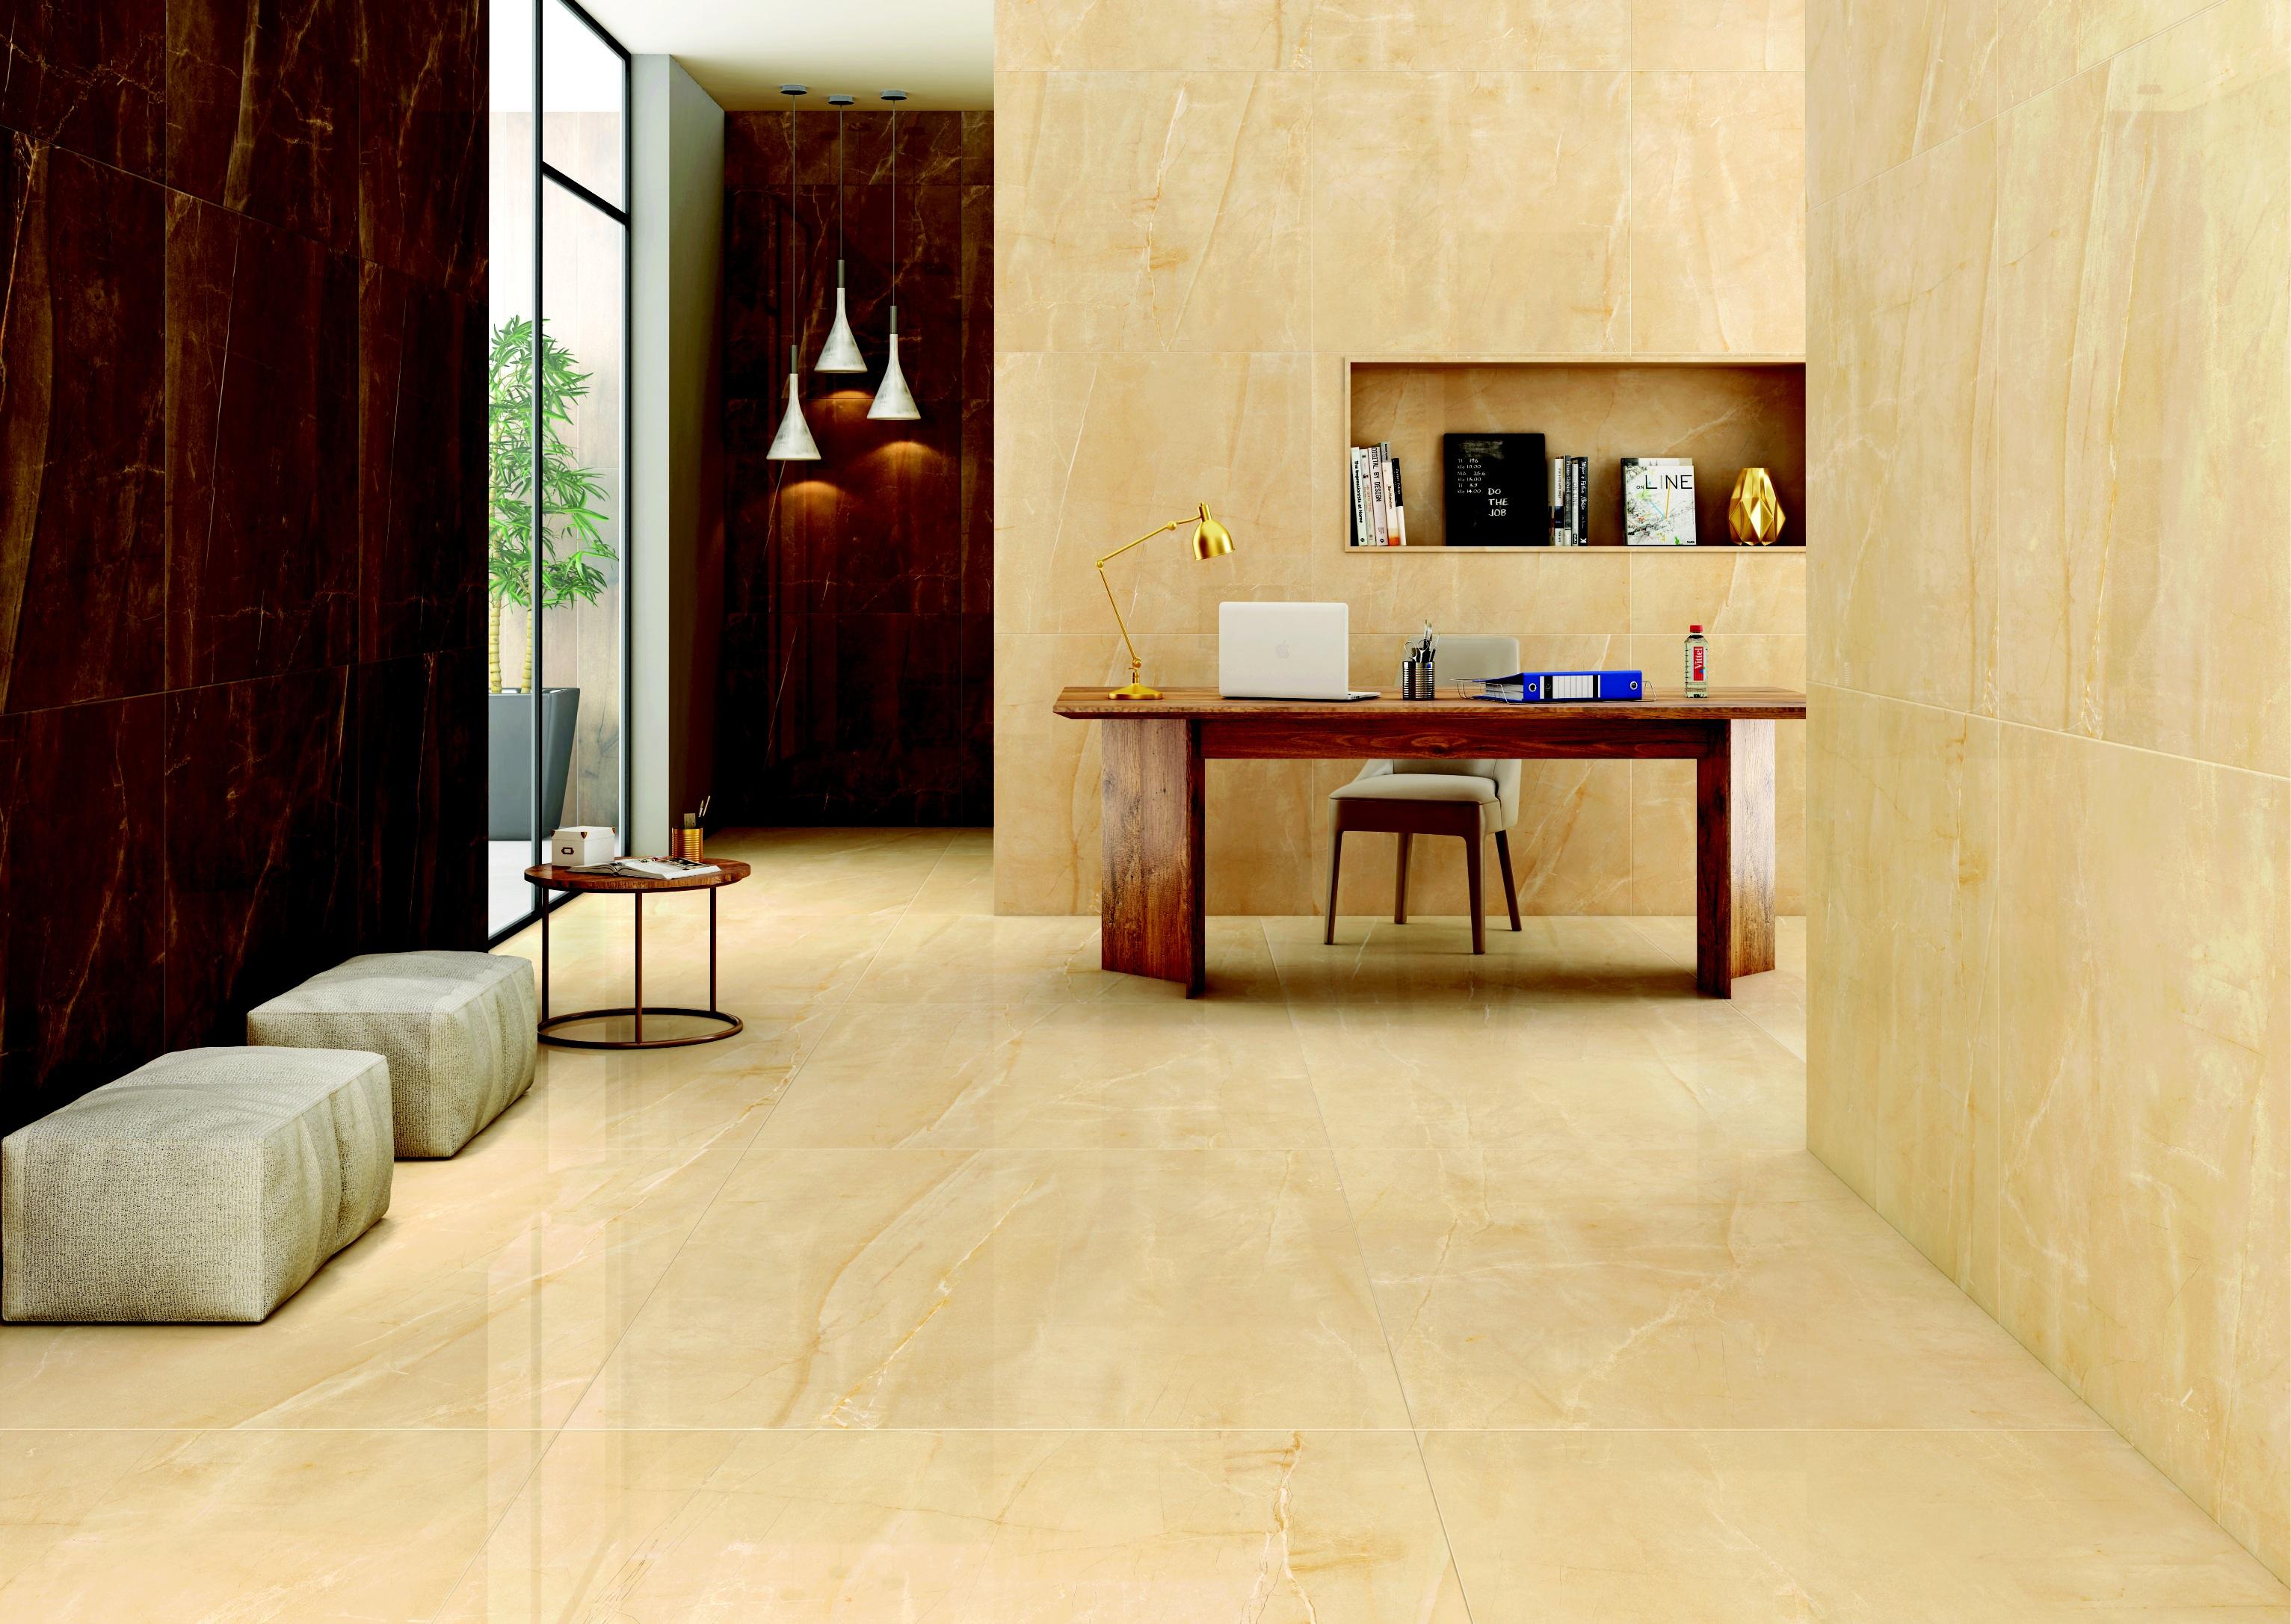 architecture-wood-house-floor-interior-home-1193857-pxhere.com.jpg